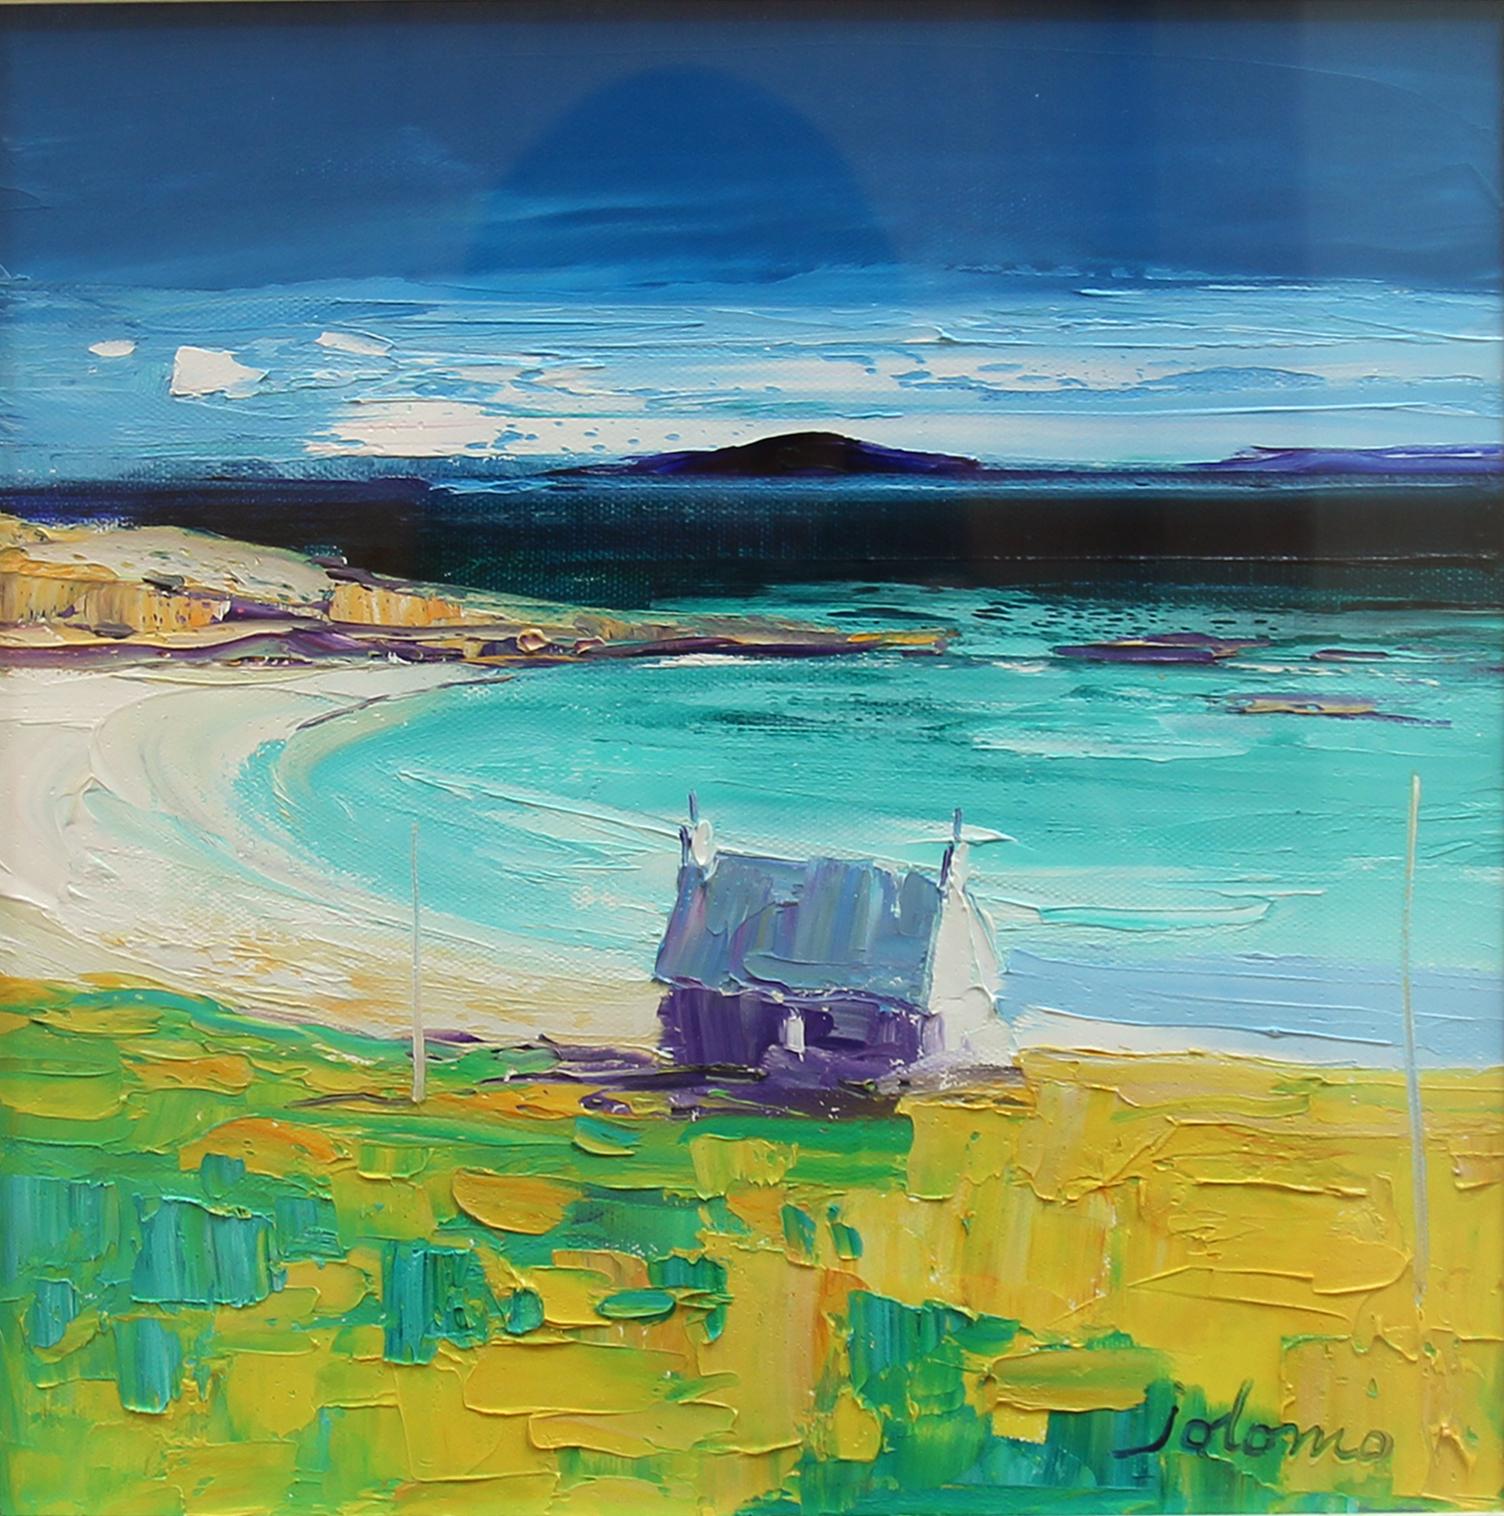 John Lowrie Morrison_Original_Oils_Uisken Beach, Isle of Mull_img size 12 x 12